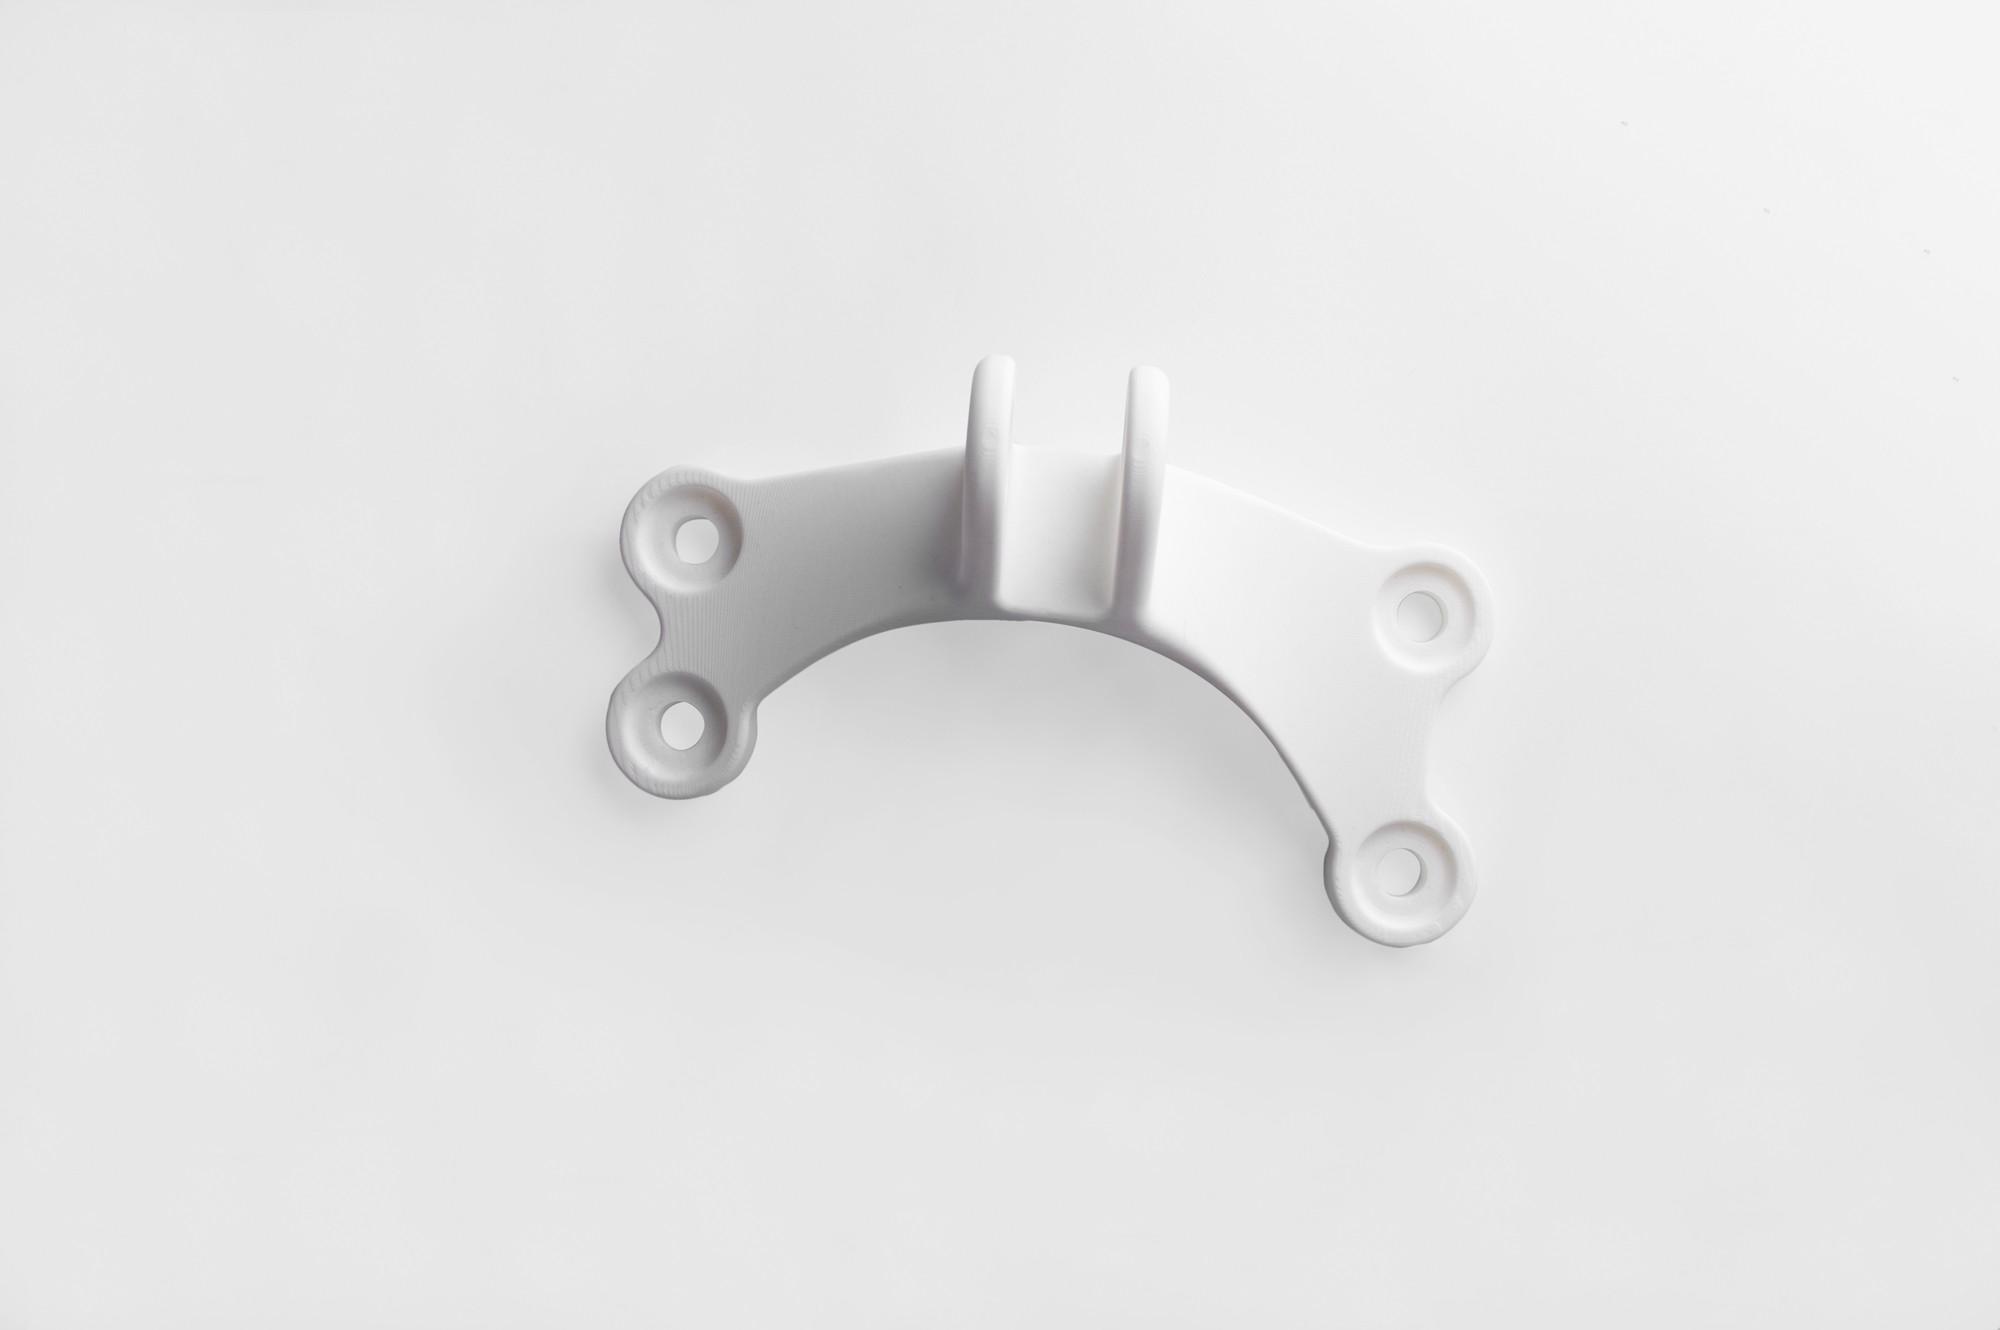 Topology Optimised 3D printed Bracket above